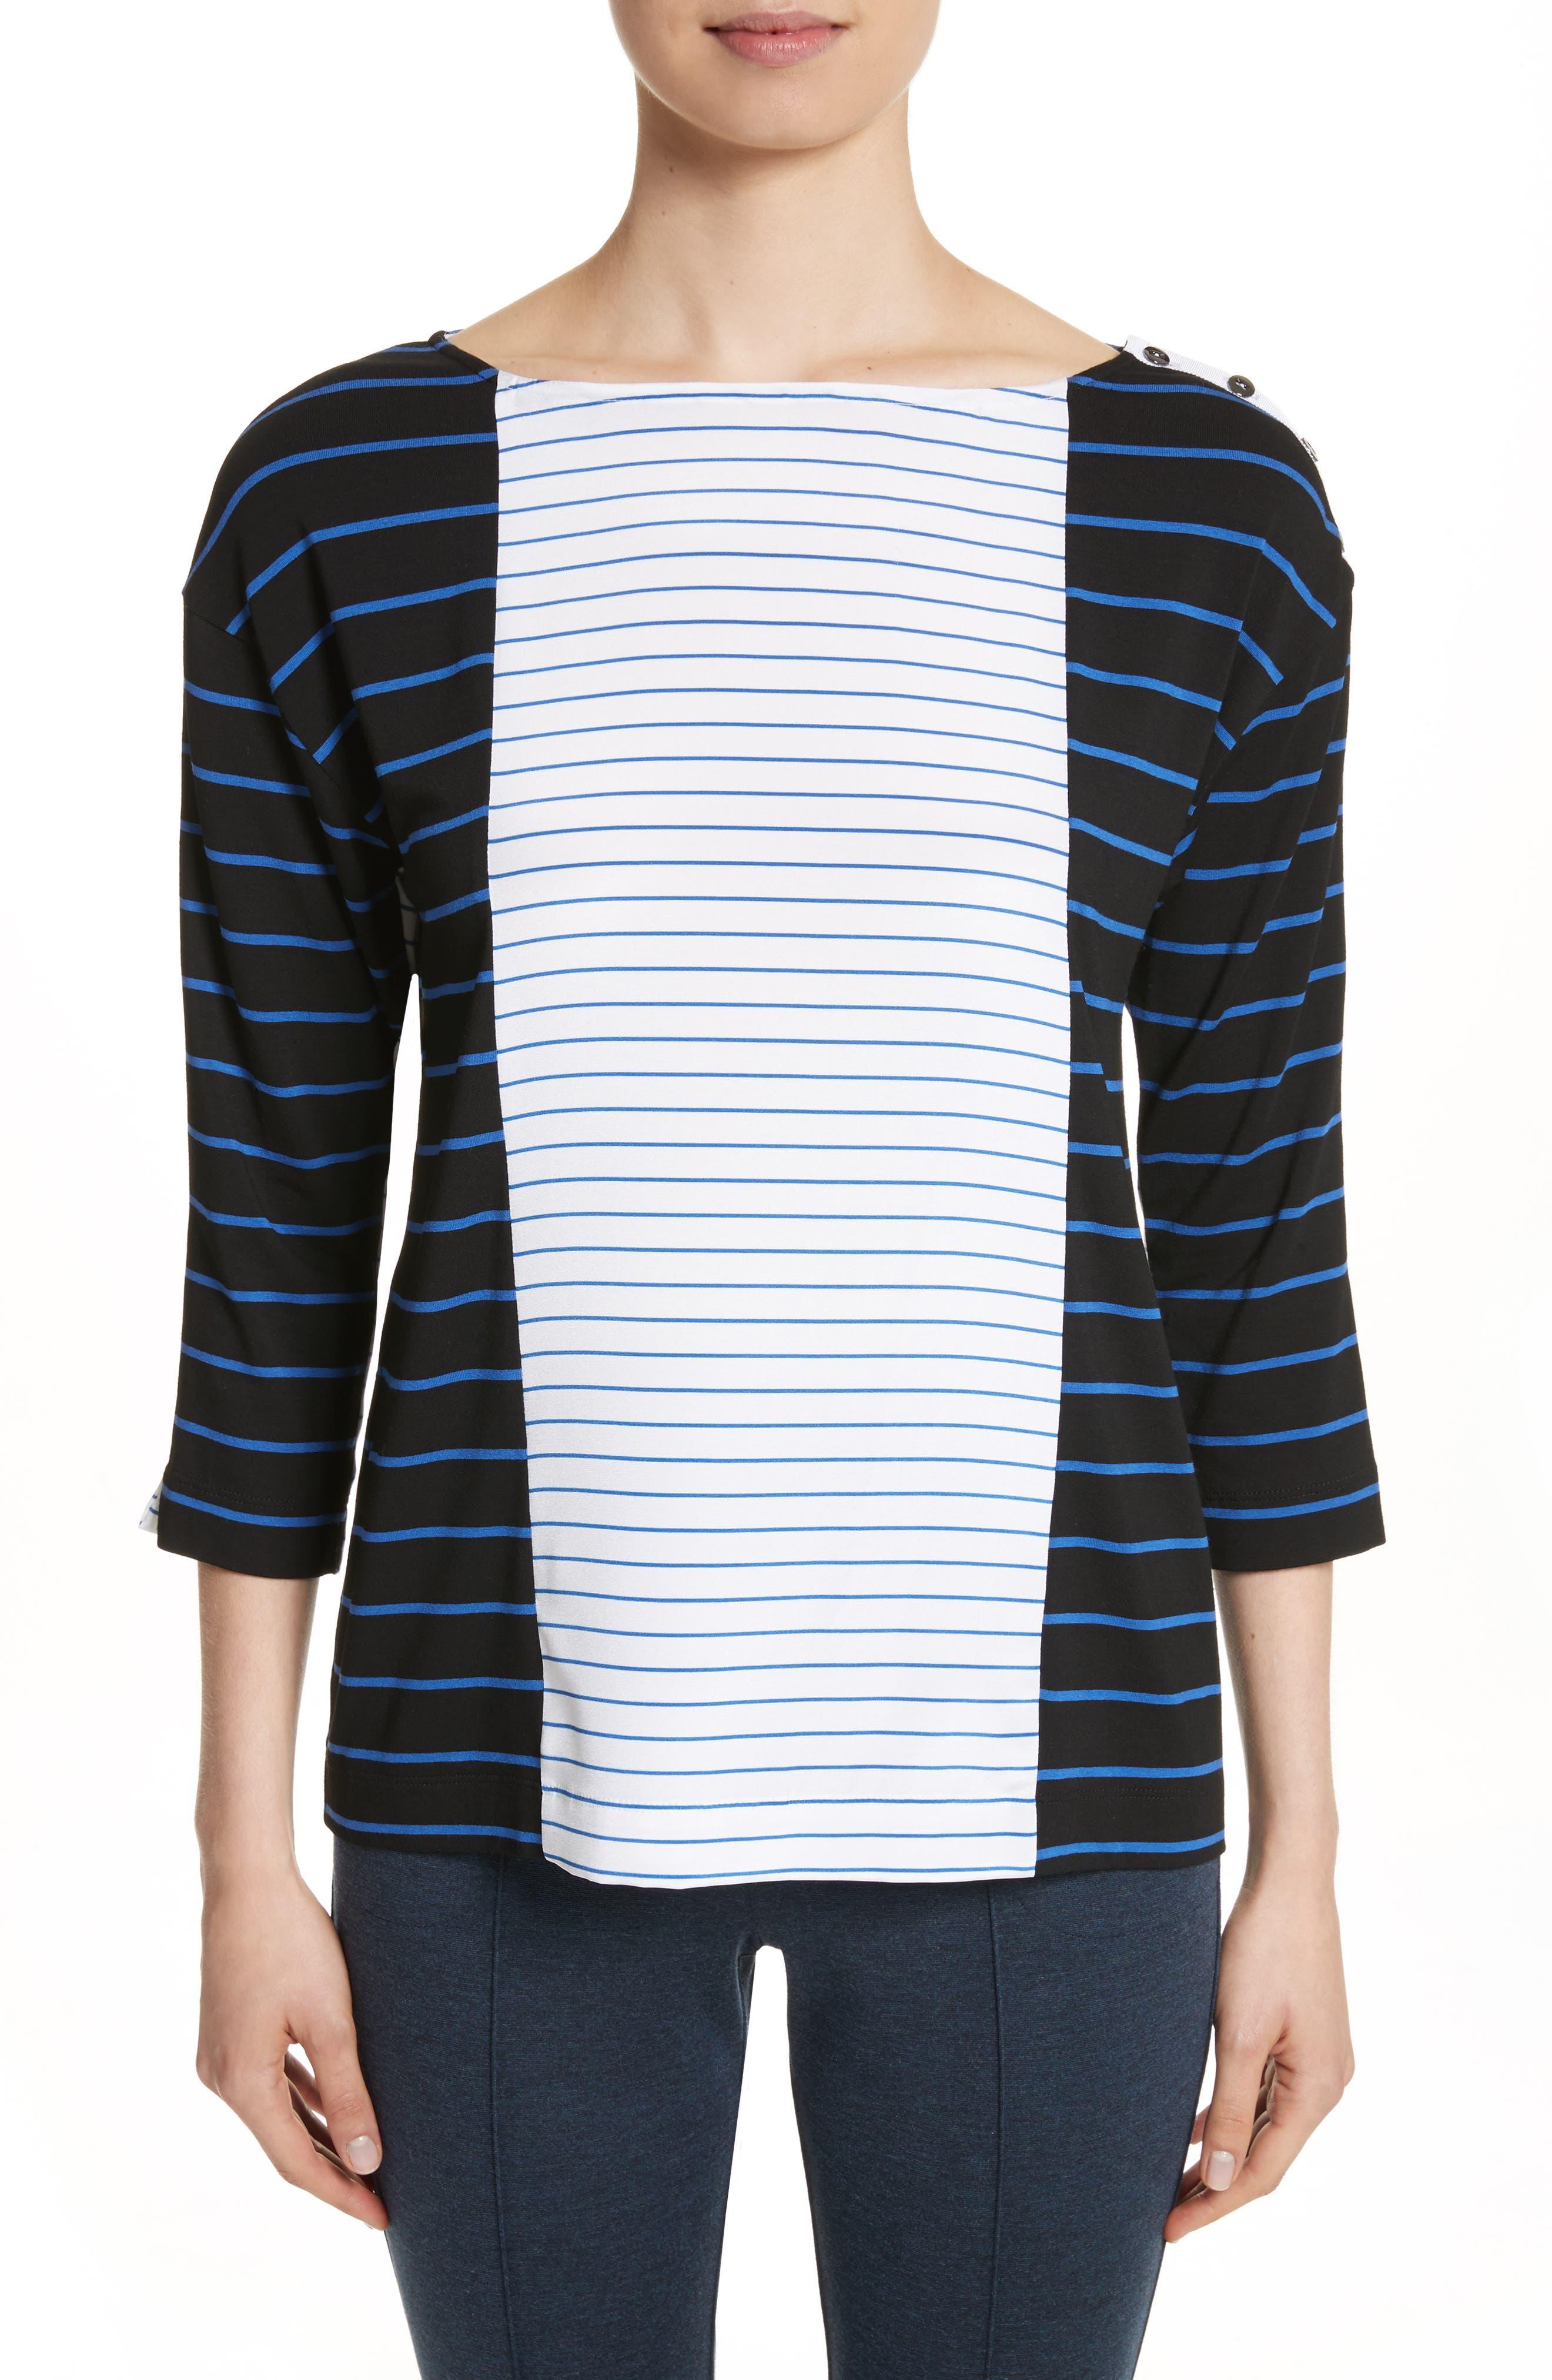 Yarn Dyed Stripe Jersey Top,                             Main thumbnail 1, color,                             Caviar/ Niagara/ Bianco